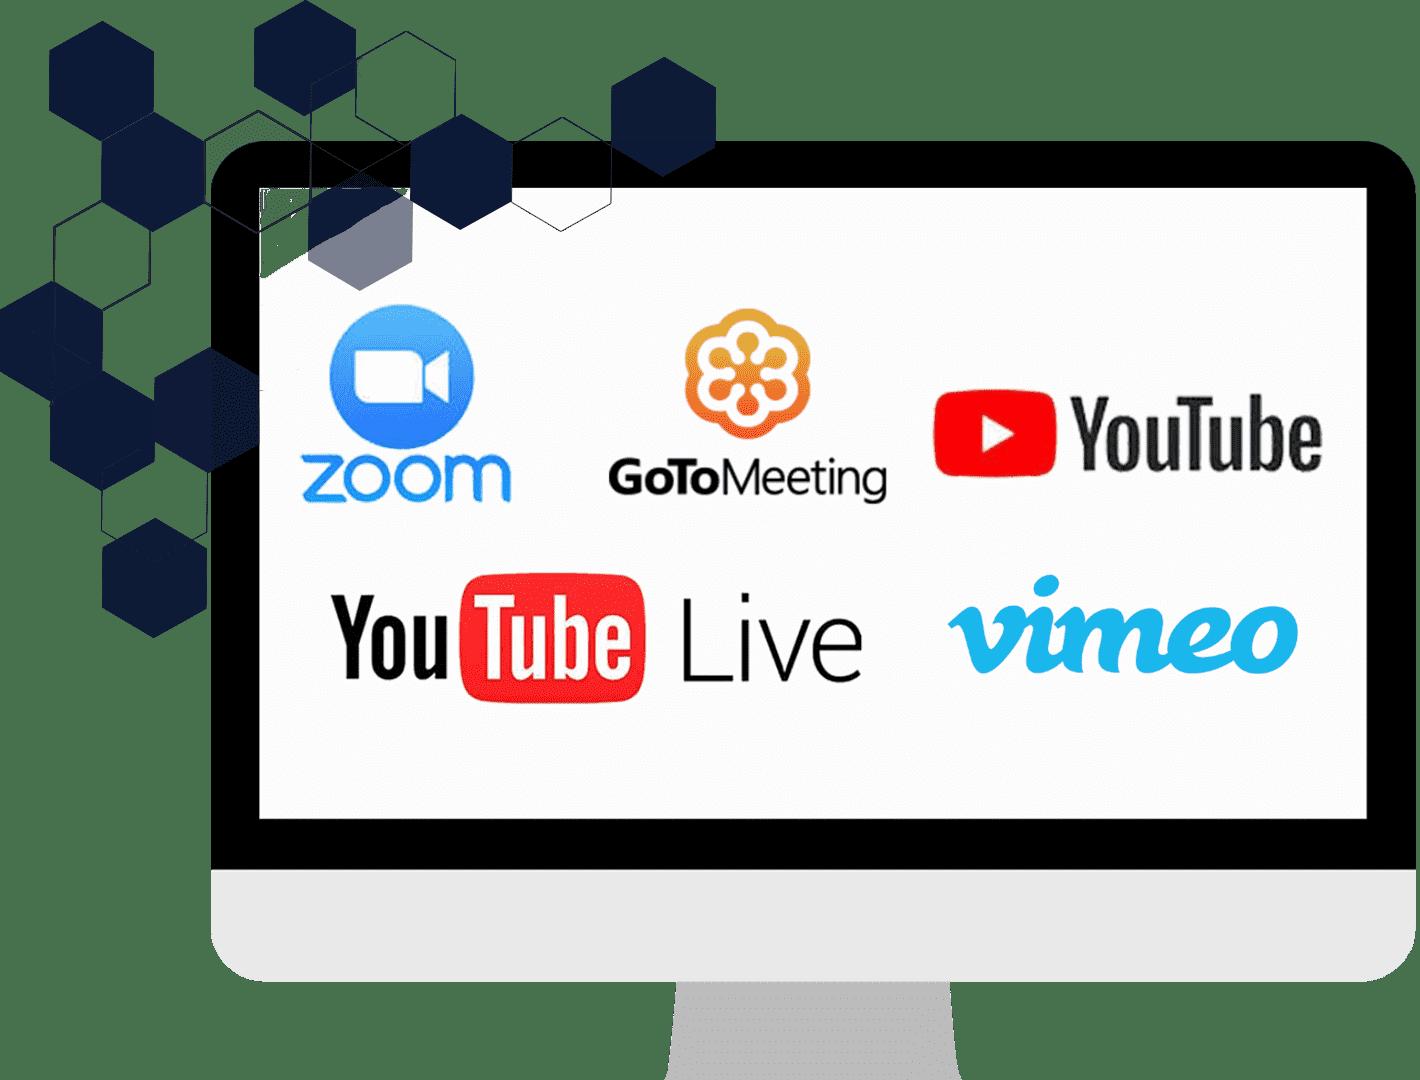 https://eventowl.com/wp-content/uploads/2020/10/VideoVersatility5.png